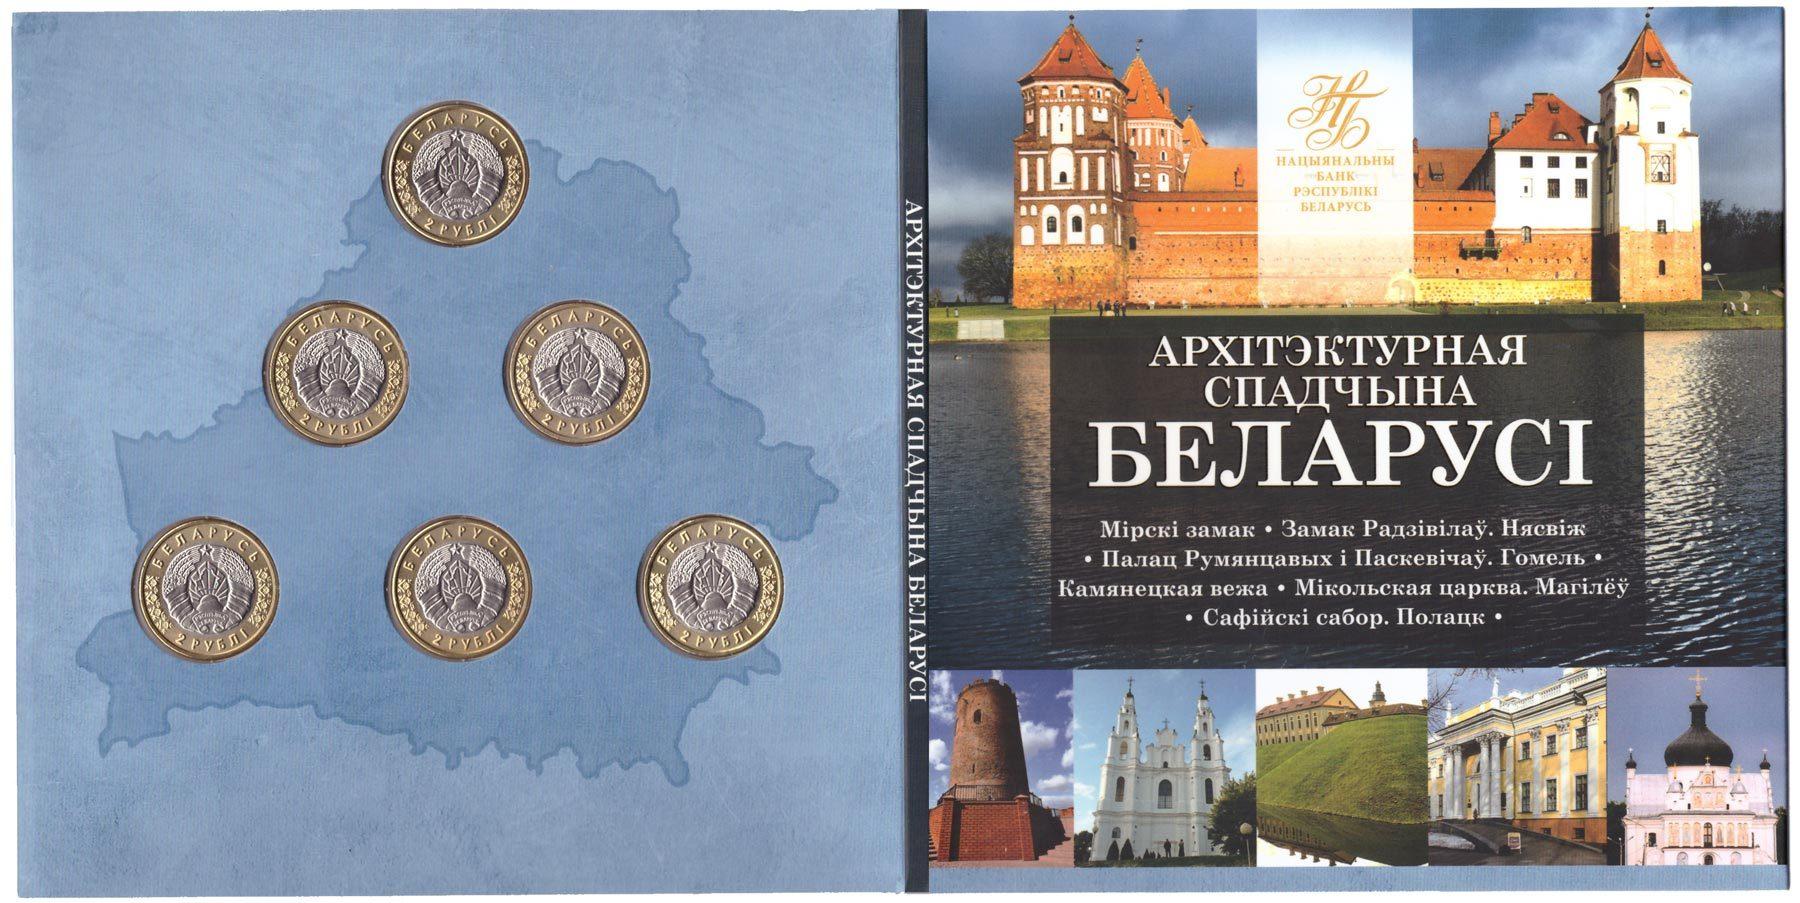 Набор из 6 монет 2 рубля. Архитектурное наследие. Беларусь. В буклете. 2018 год. UNC